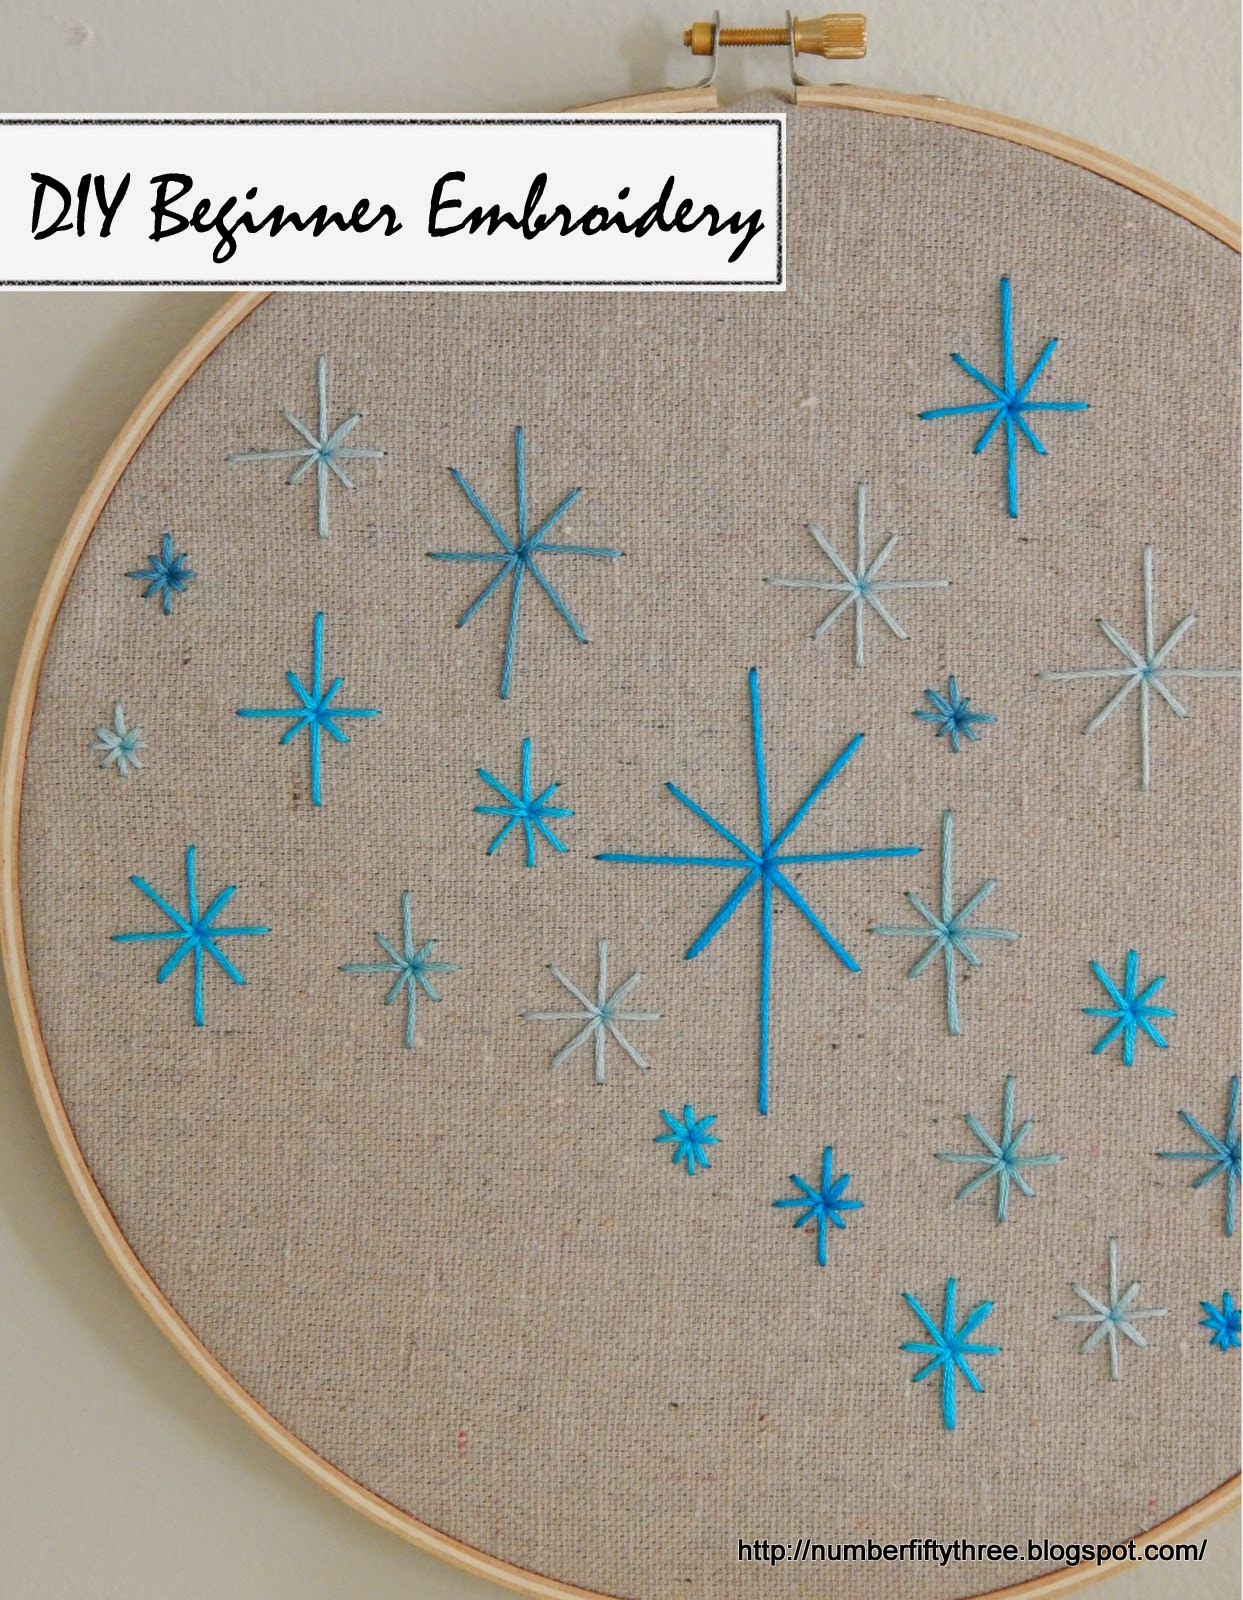 Diy beginner embroidery jennifer rizzo